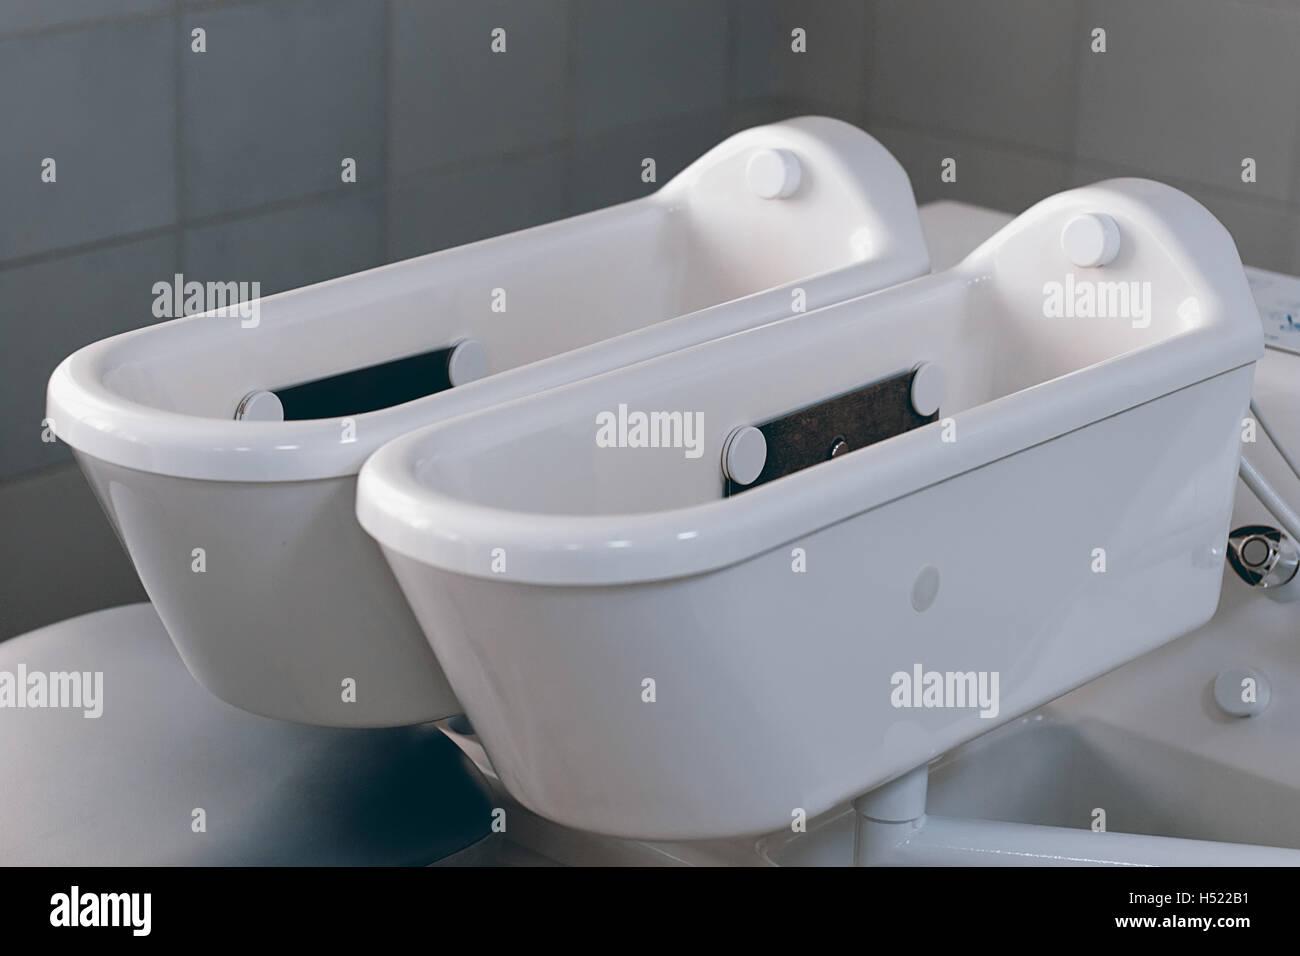 bath tub photos bath tub images alamy. Black Bedroom Furniture Sets. Home Design Ideas